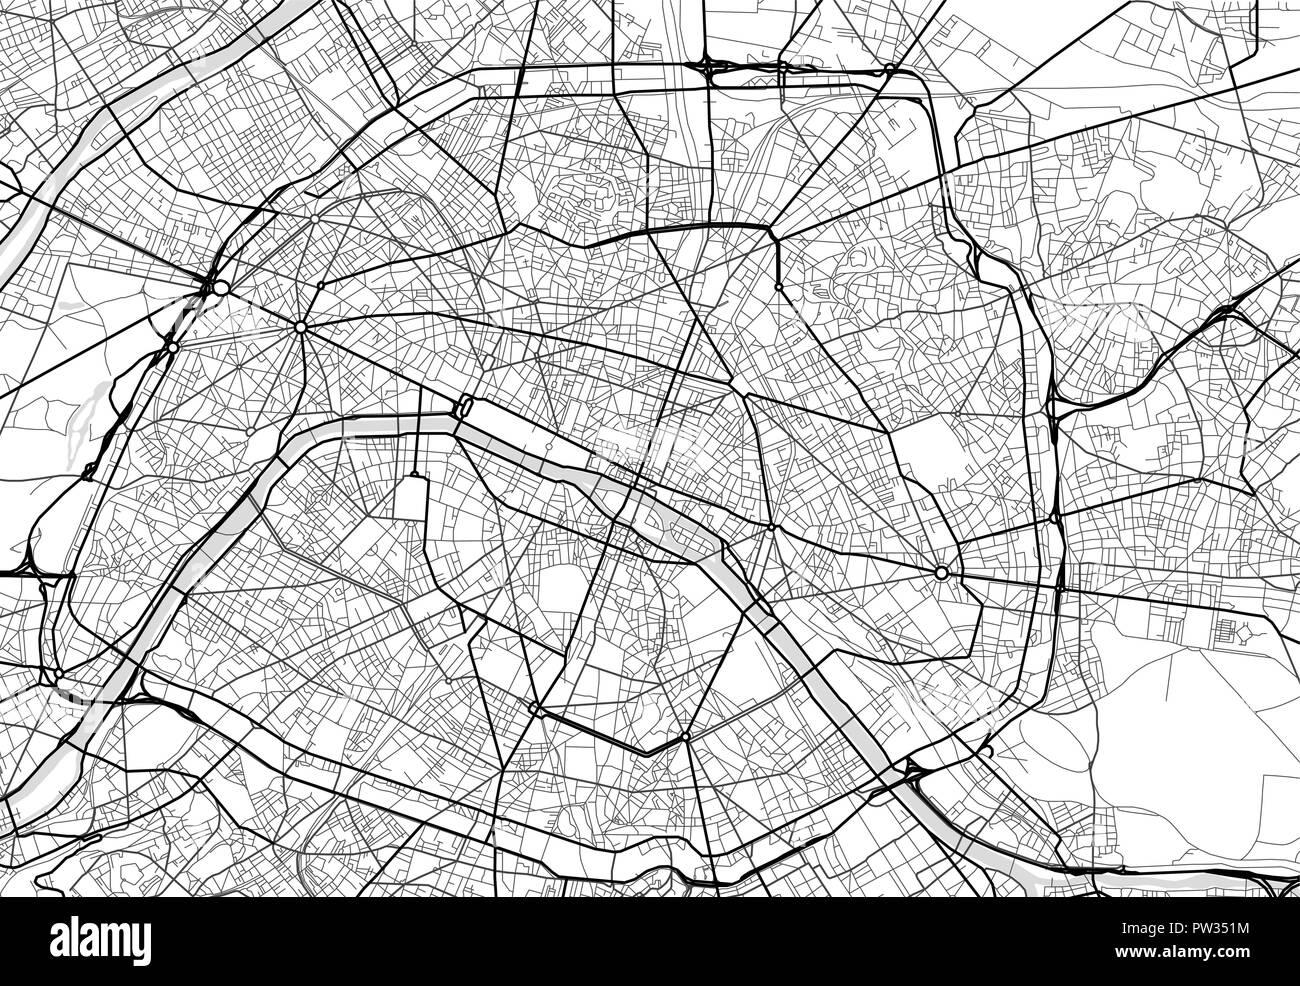 Black White Map Paris France Stockfotos & Black White Map ...